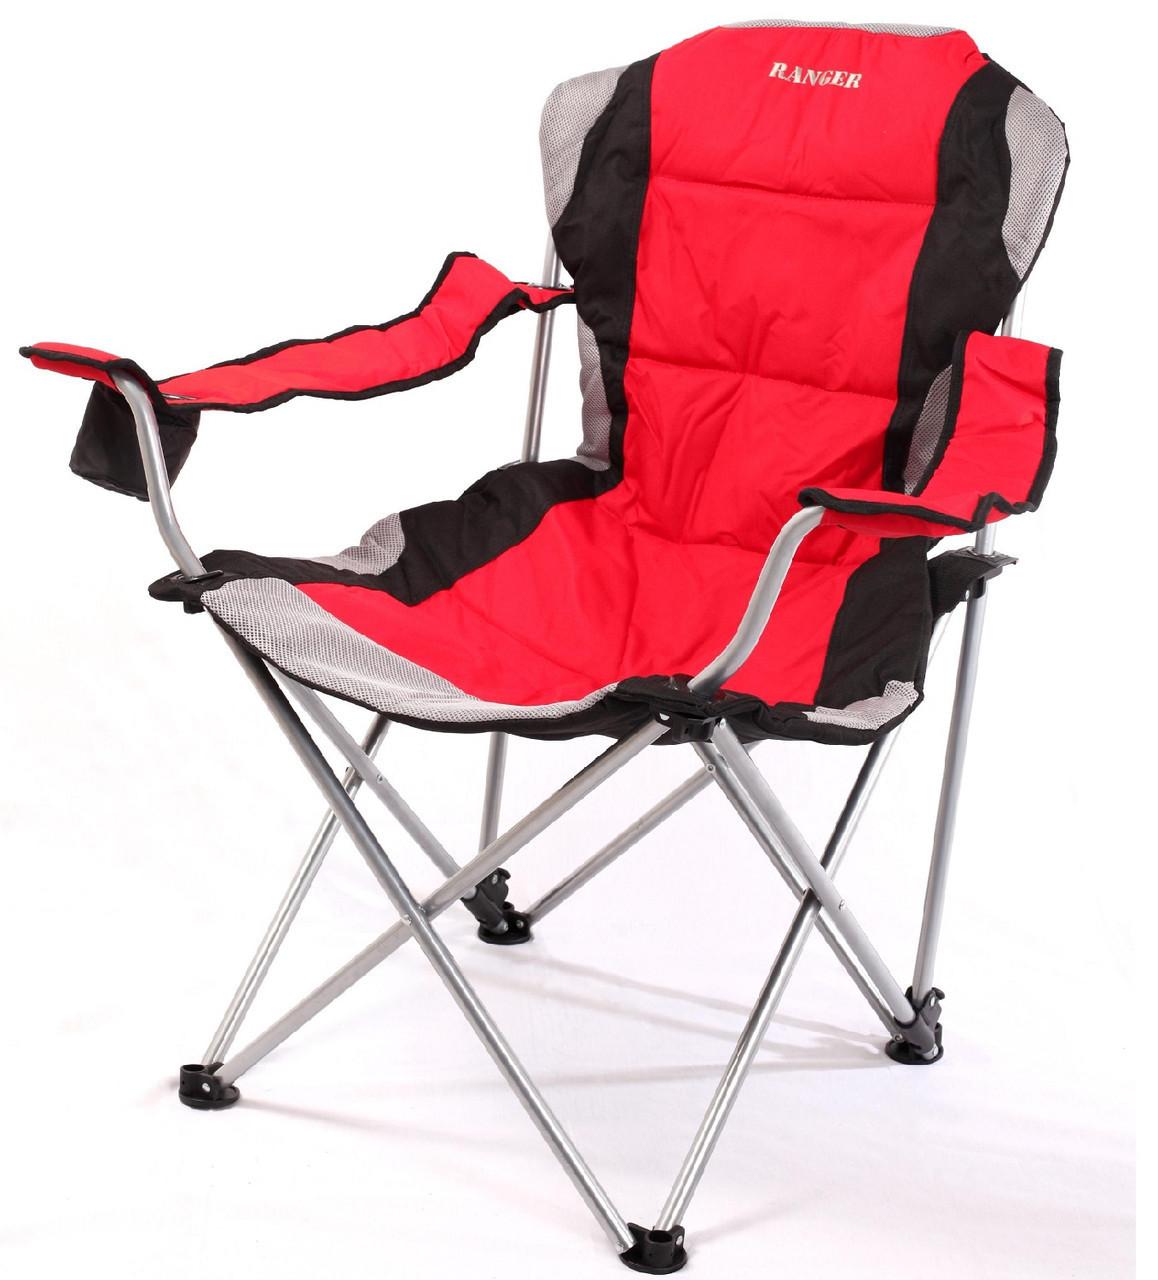 Крісло - шезлонг складне Ranger FC 750-052 RA 2212